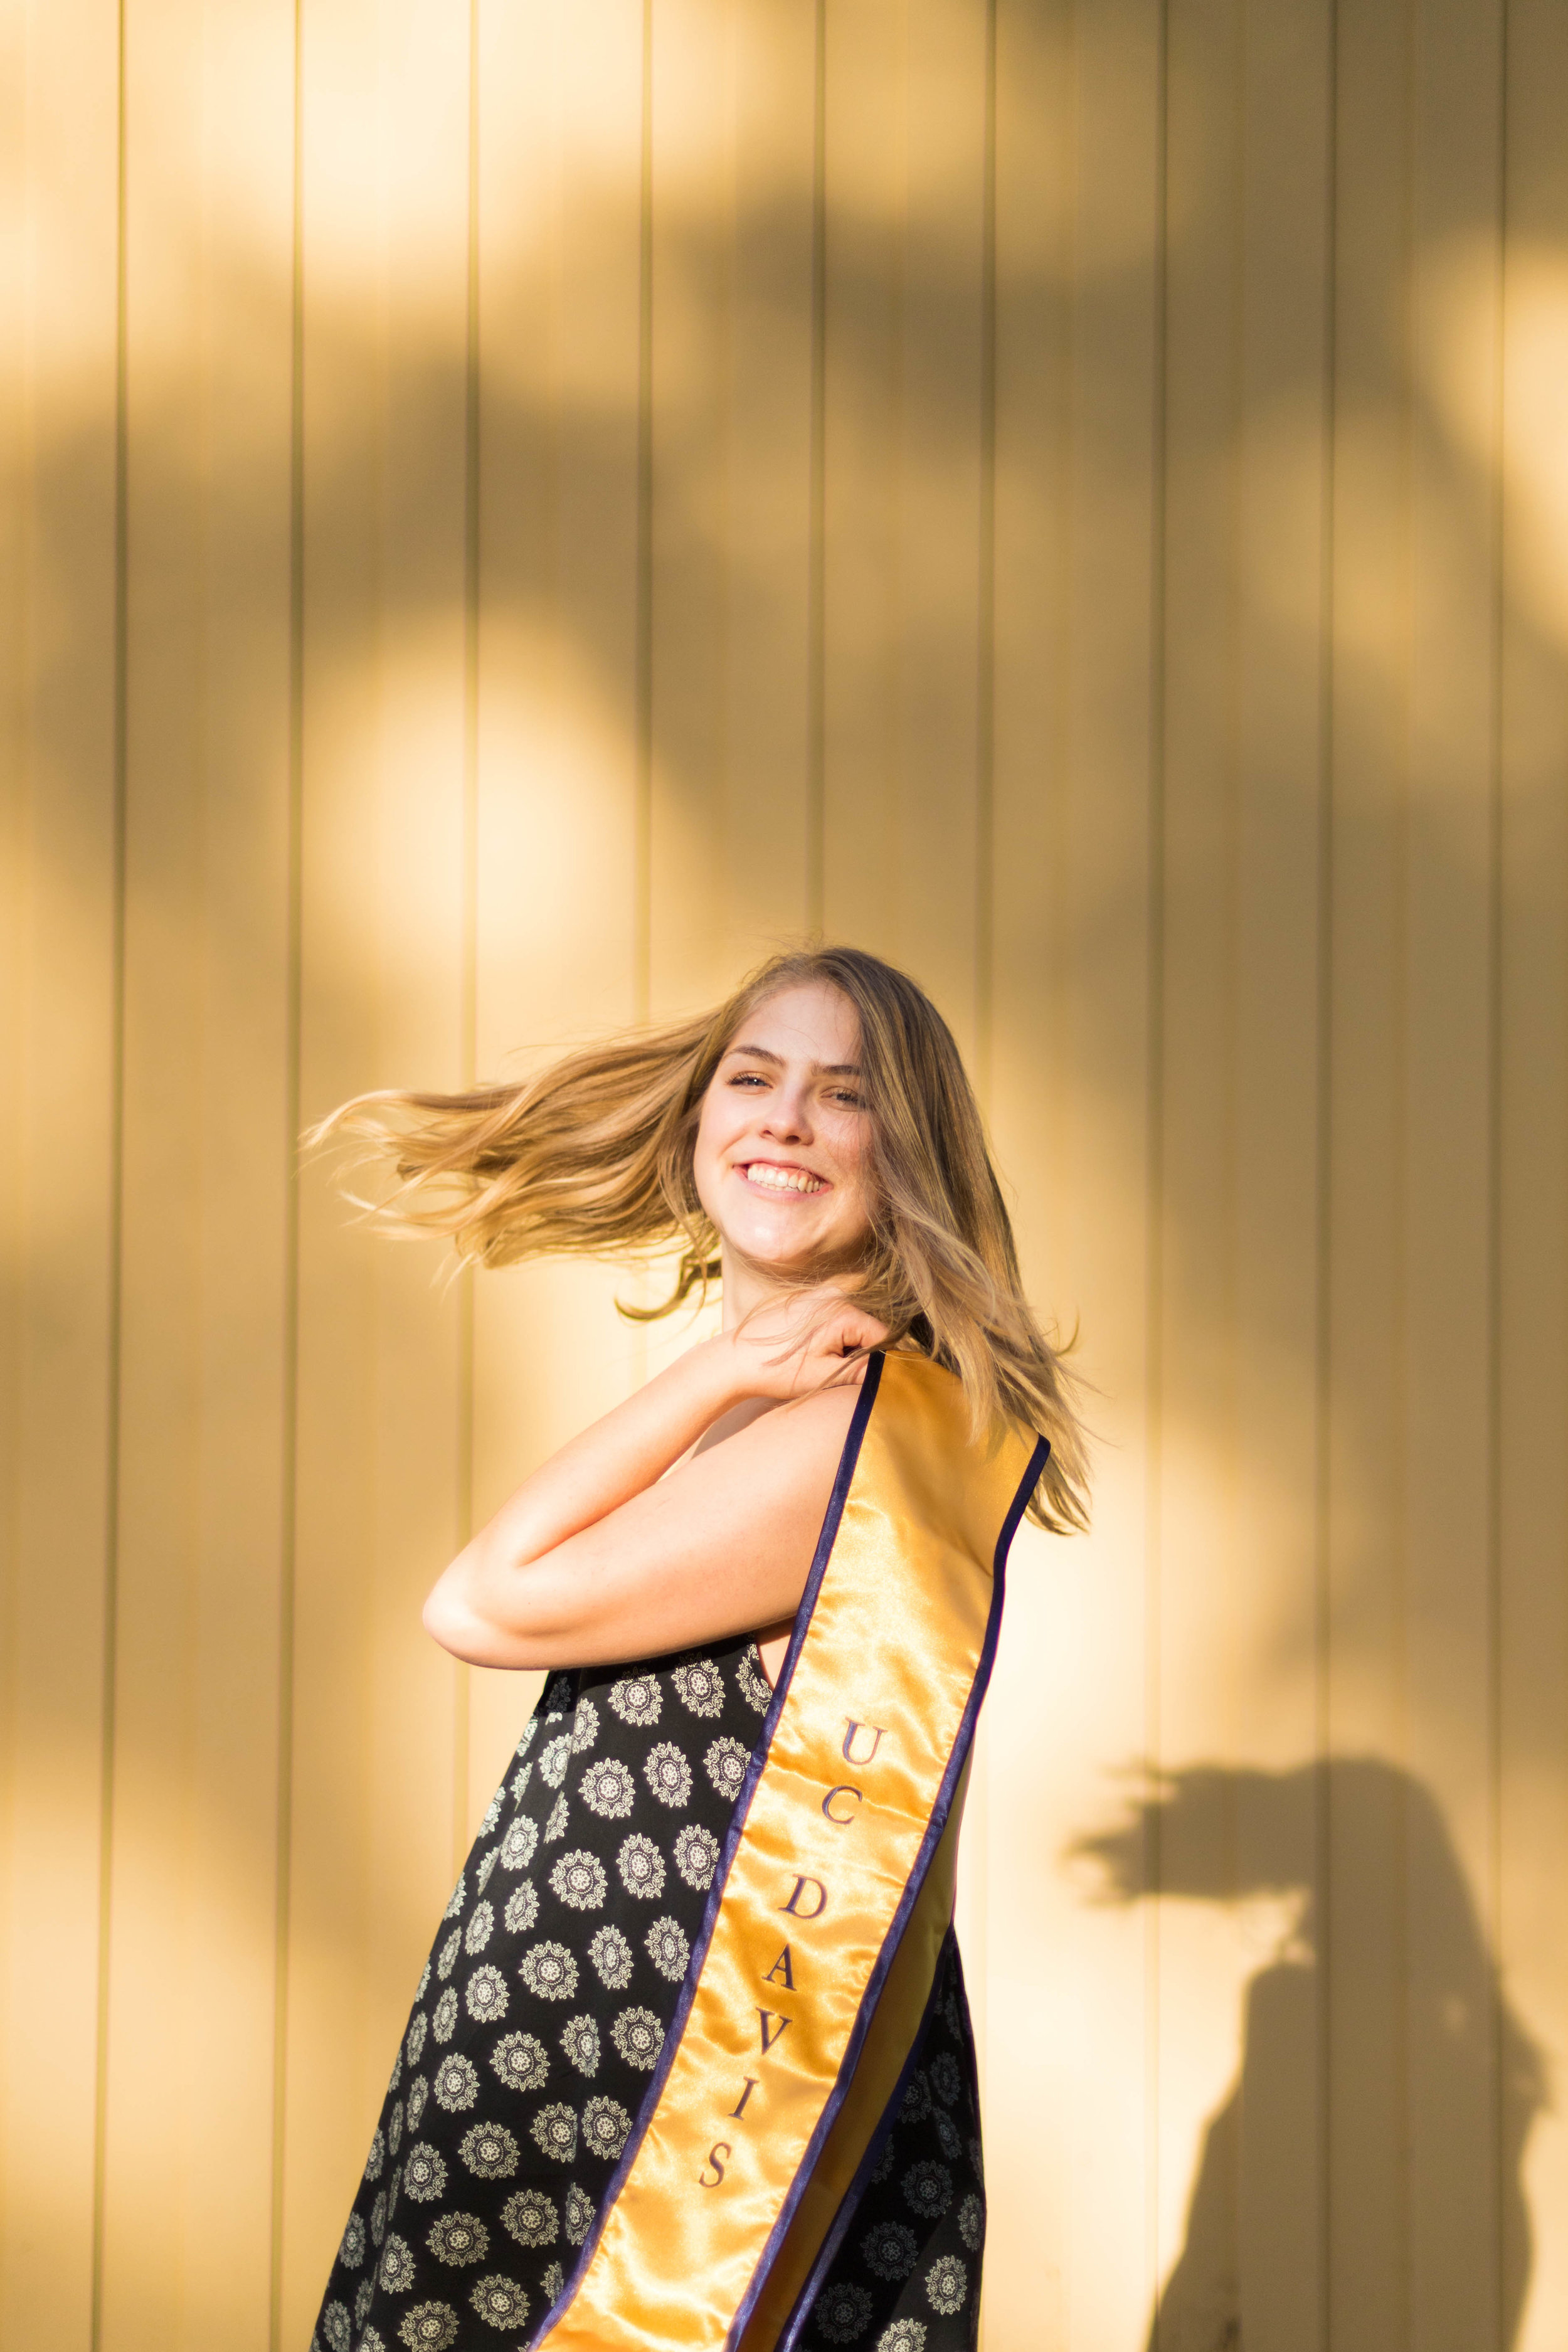 2018-05-19_Lily_Graduation_0010.jpg